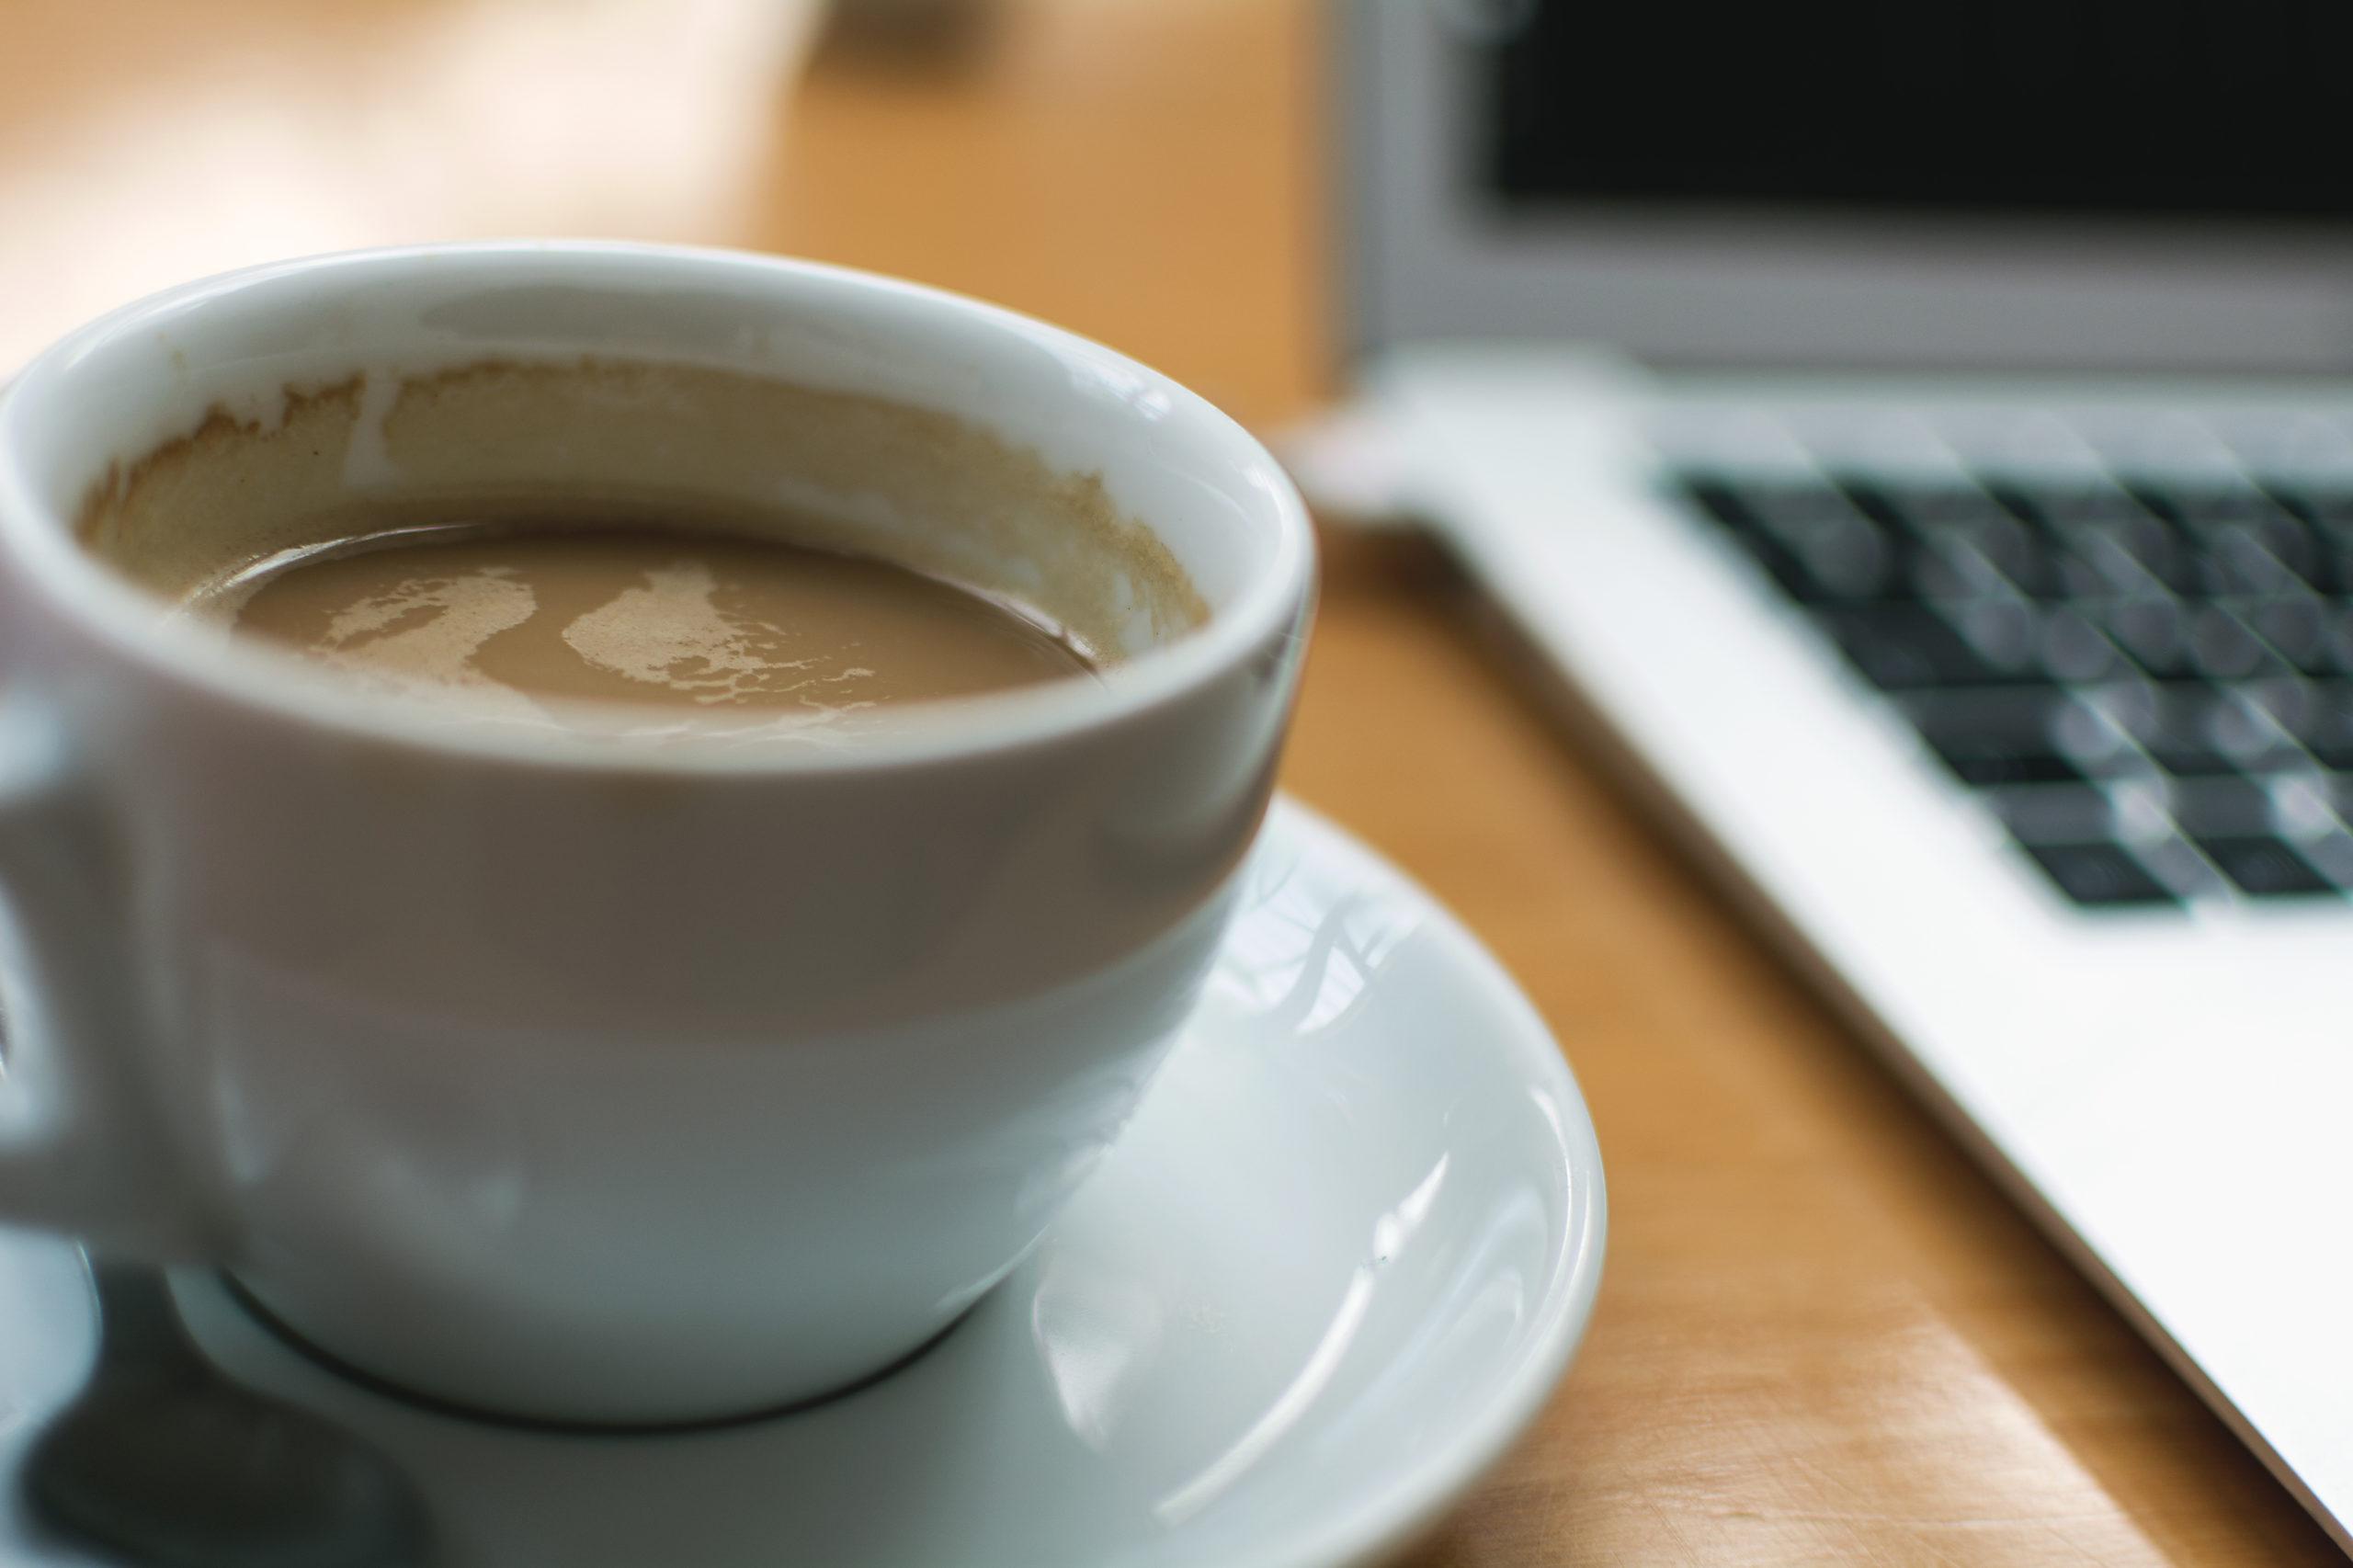 Health Benefits of Coffee – Good Reasons to Drink Coffee